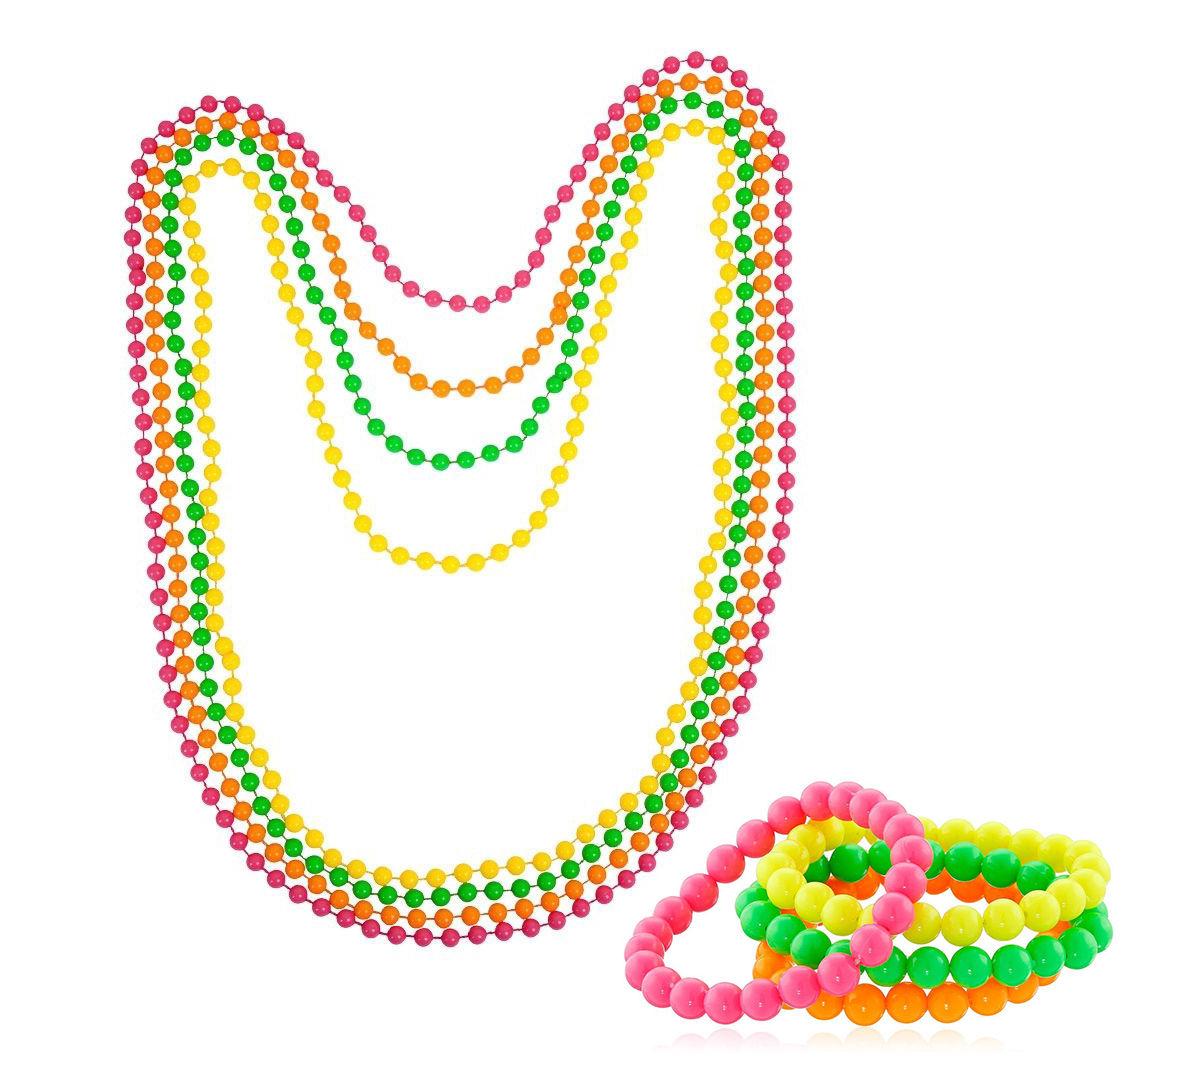 Neon Beads Necklace/Bracelet 80s Costume Accessory Bright Rave Fancy Dress